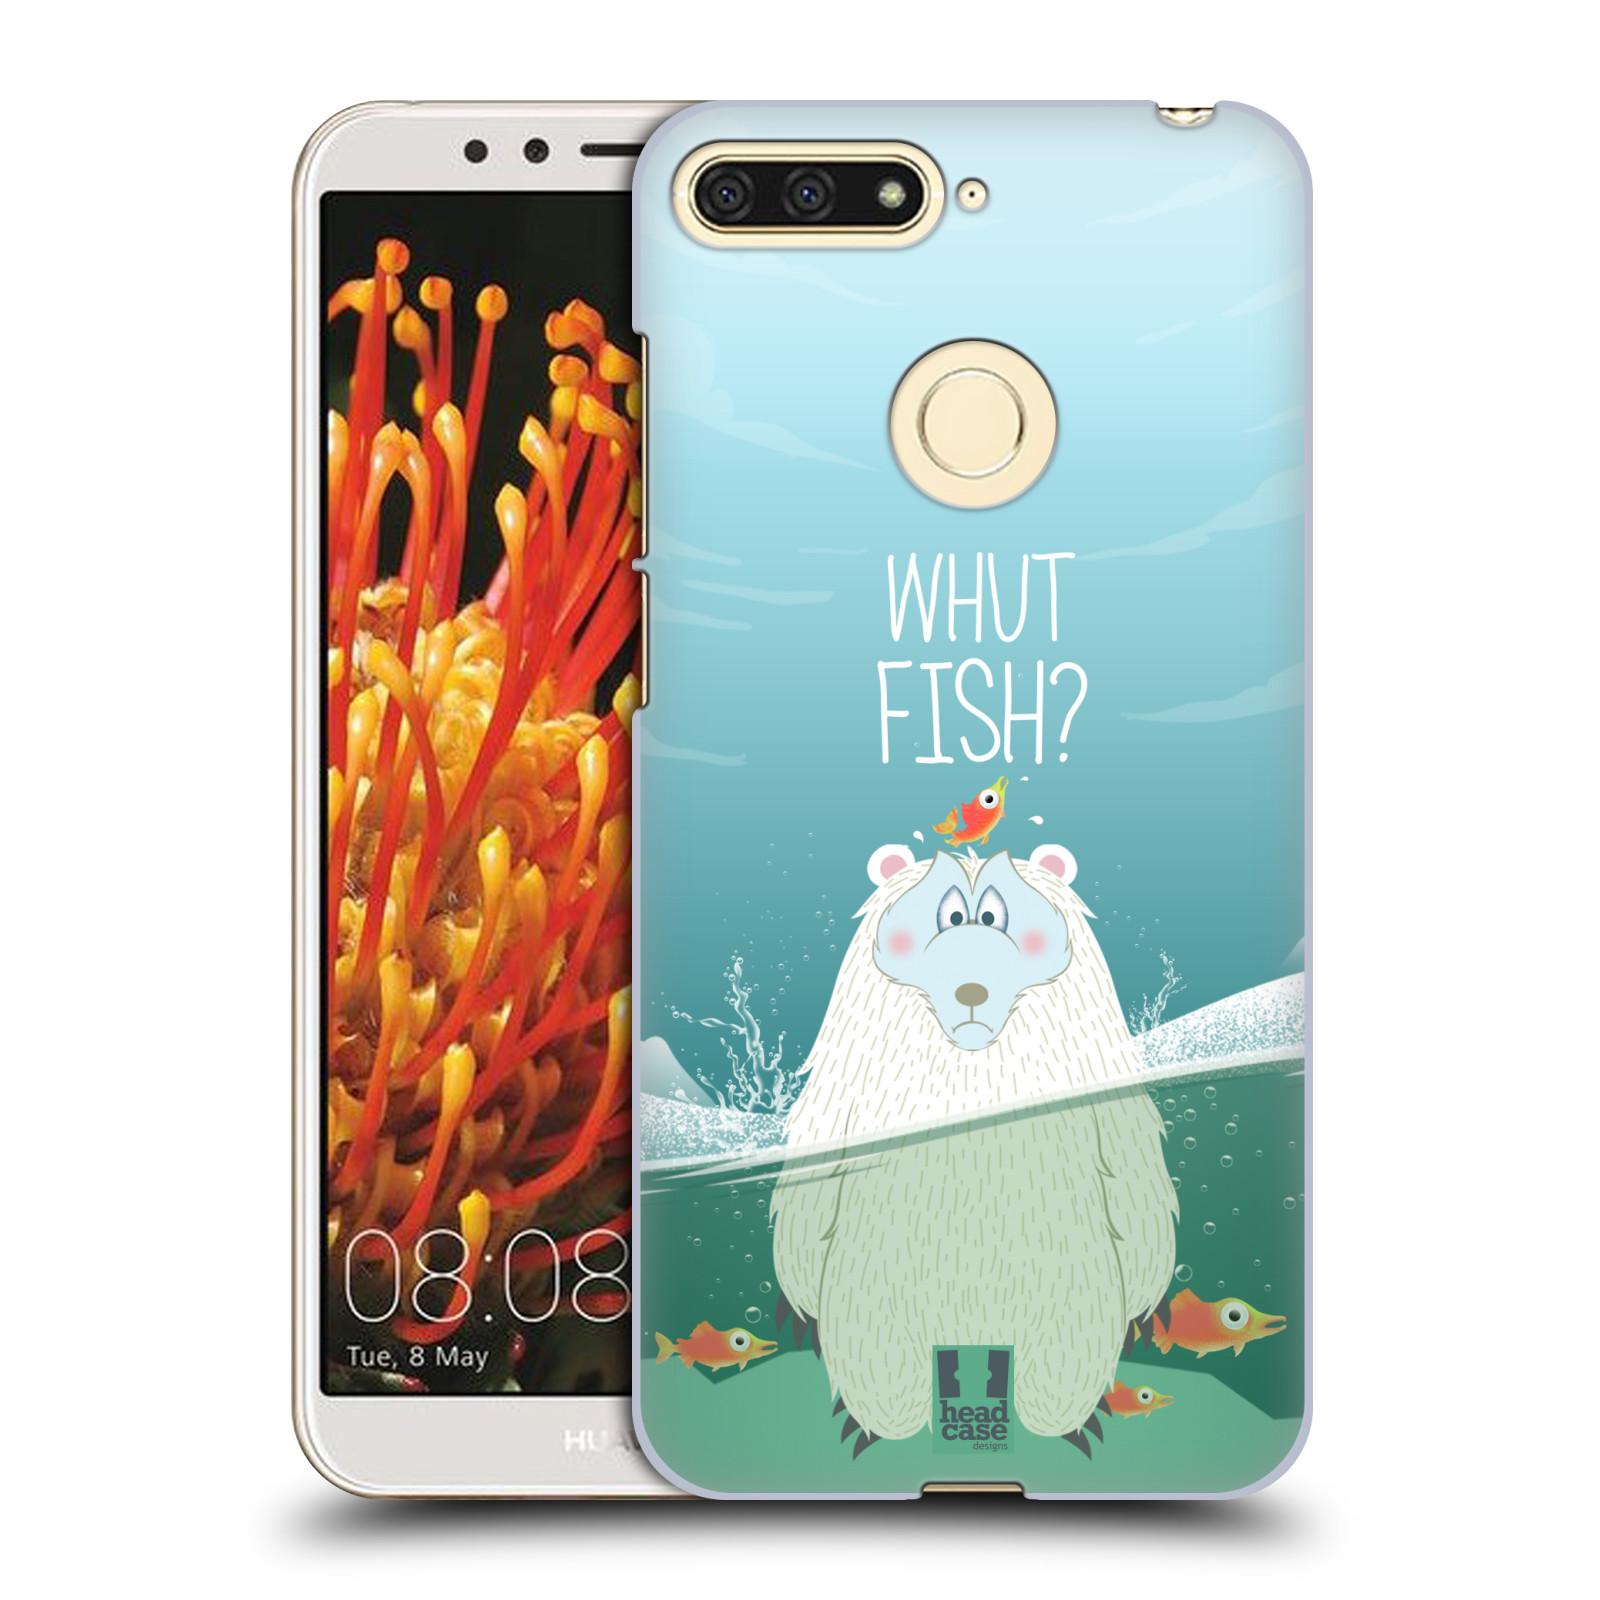 Plastové pouzdro na mobil Huawei Y6 Prime 2018 - Head Case - Medvěd Whut Fish?